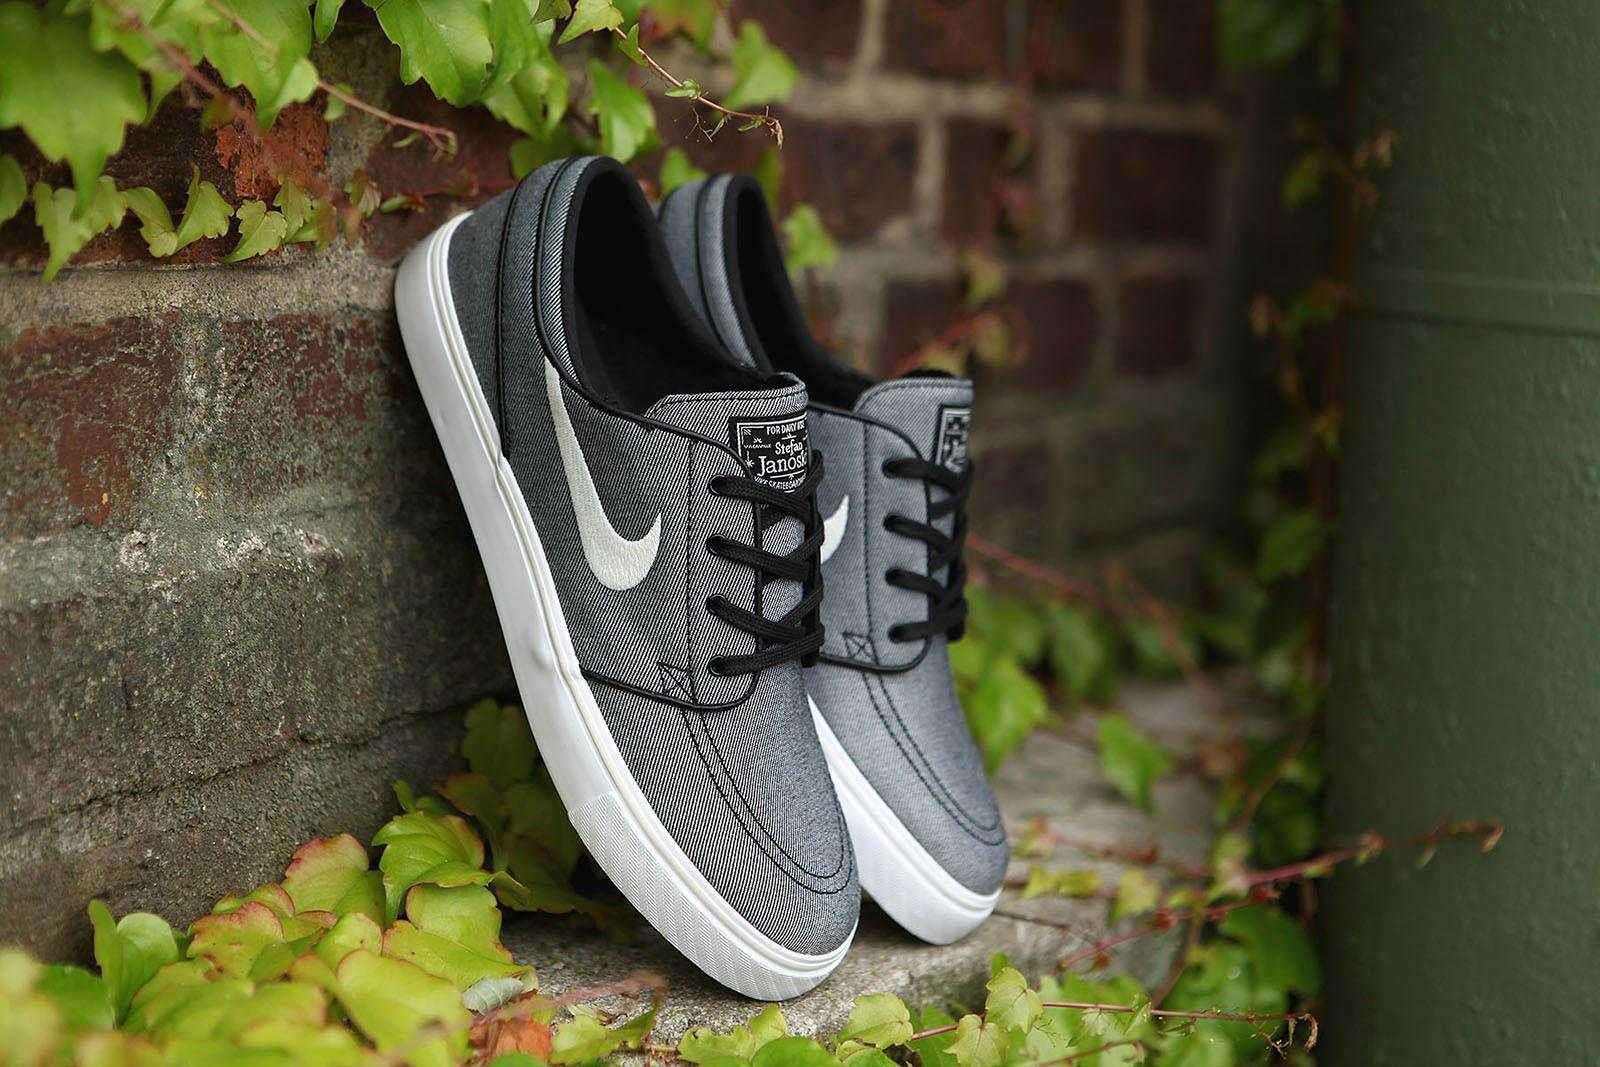 Nike SB Janoski Elite HT Black Black  https://www.popname.cz/cze/produkt.html/nike-sb/footwear/boty-nike-sb -air-zoom-stefan-janoski-elite-ht-skatebo…